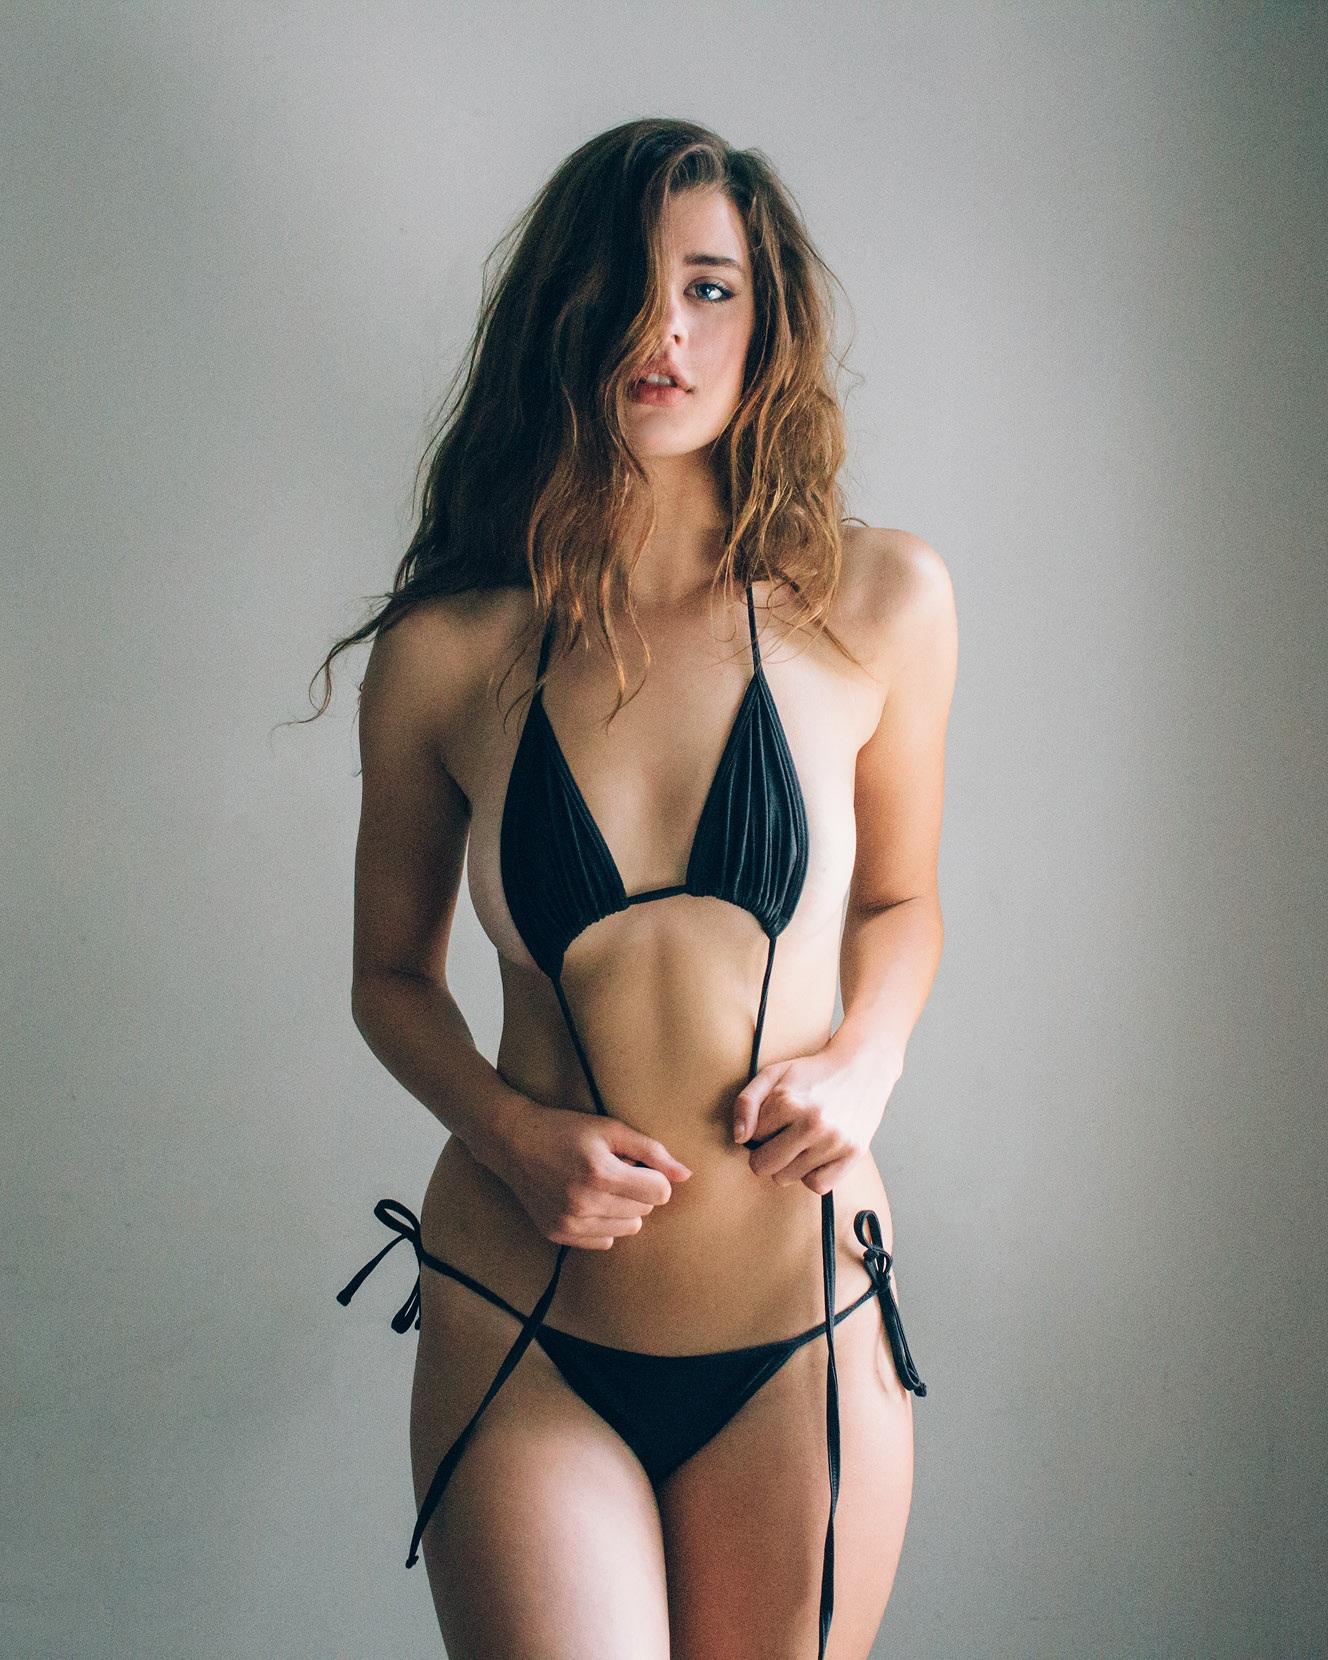 Hot Sarah McDaniel naked (96 photos), Tits, Cleavage, Selfie, braless 2019